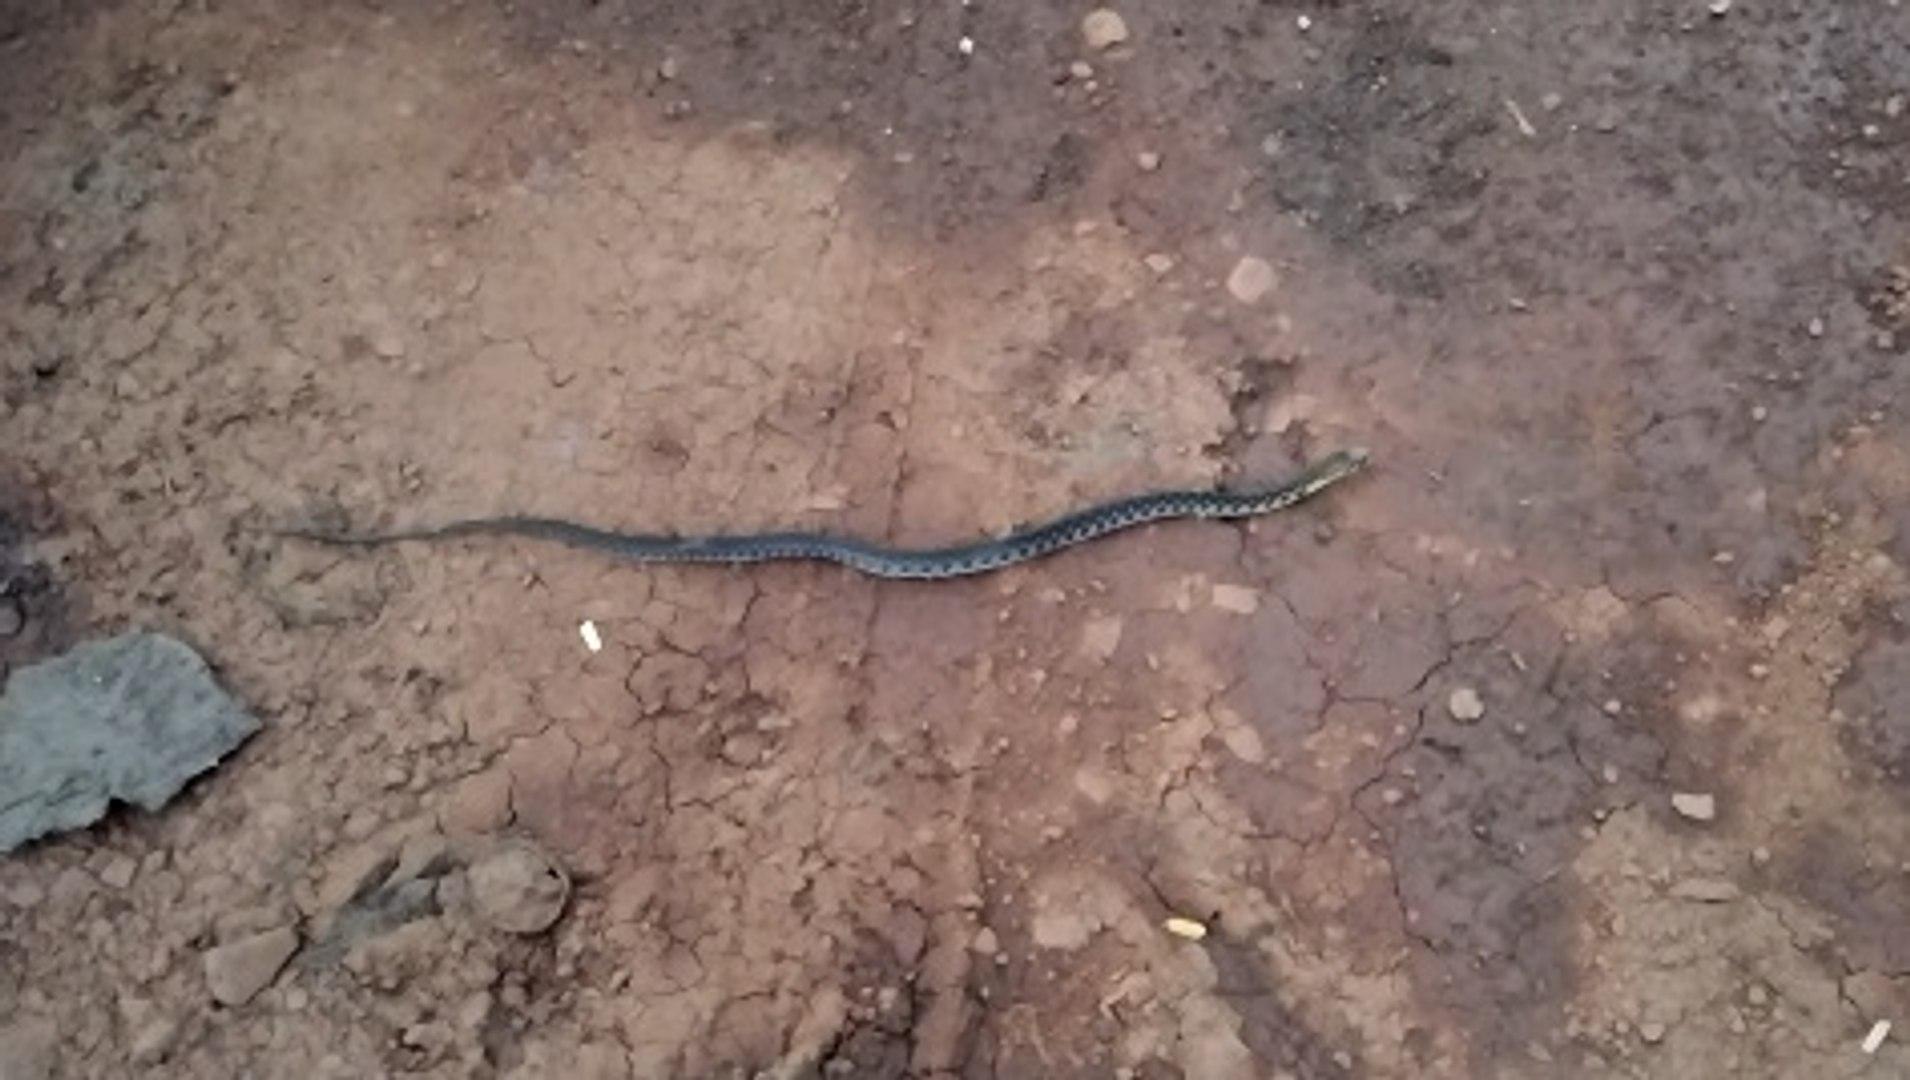 Beautiful Baby Snake - Wild Animal - Animal Planet - Nature Documentary HD